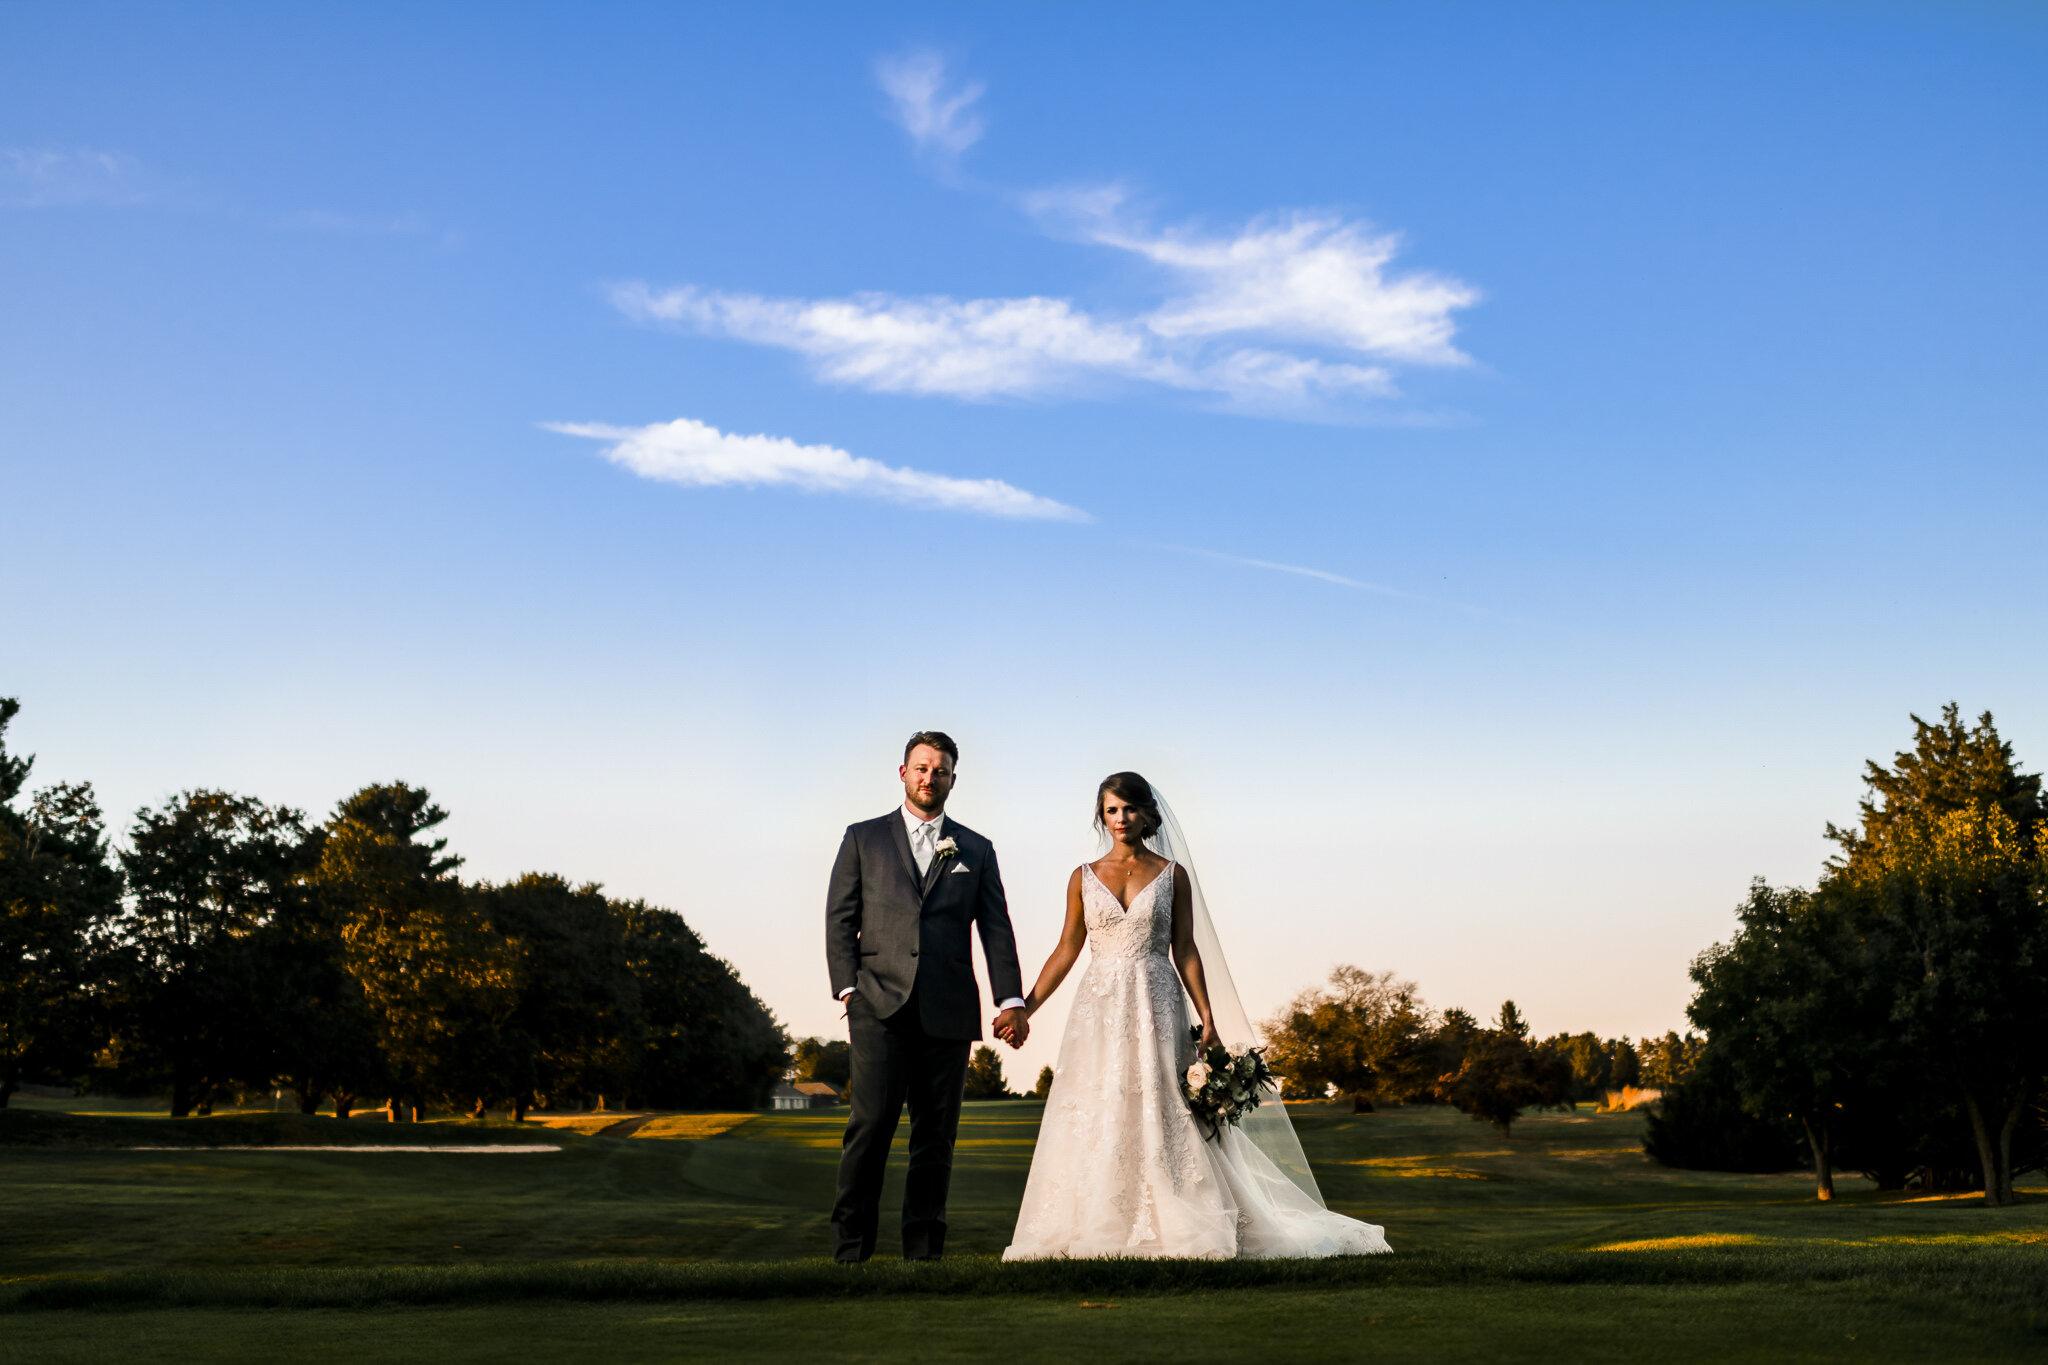 Coyle-Forsgate-Country-Club-Wedding-Photographer-27.JPG